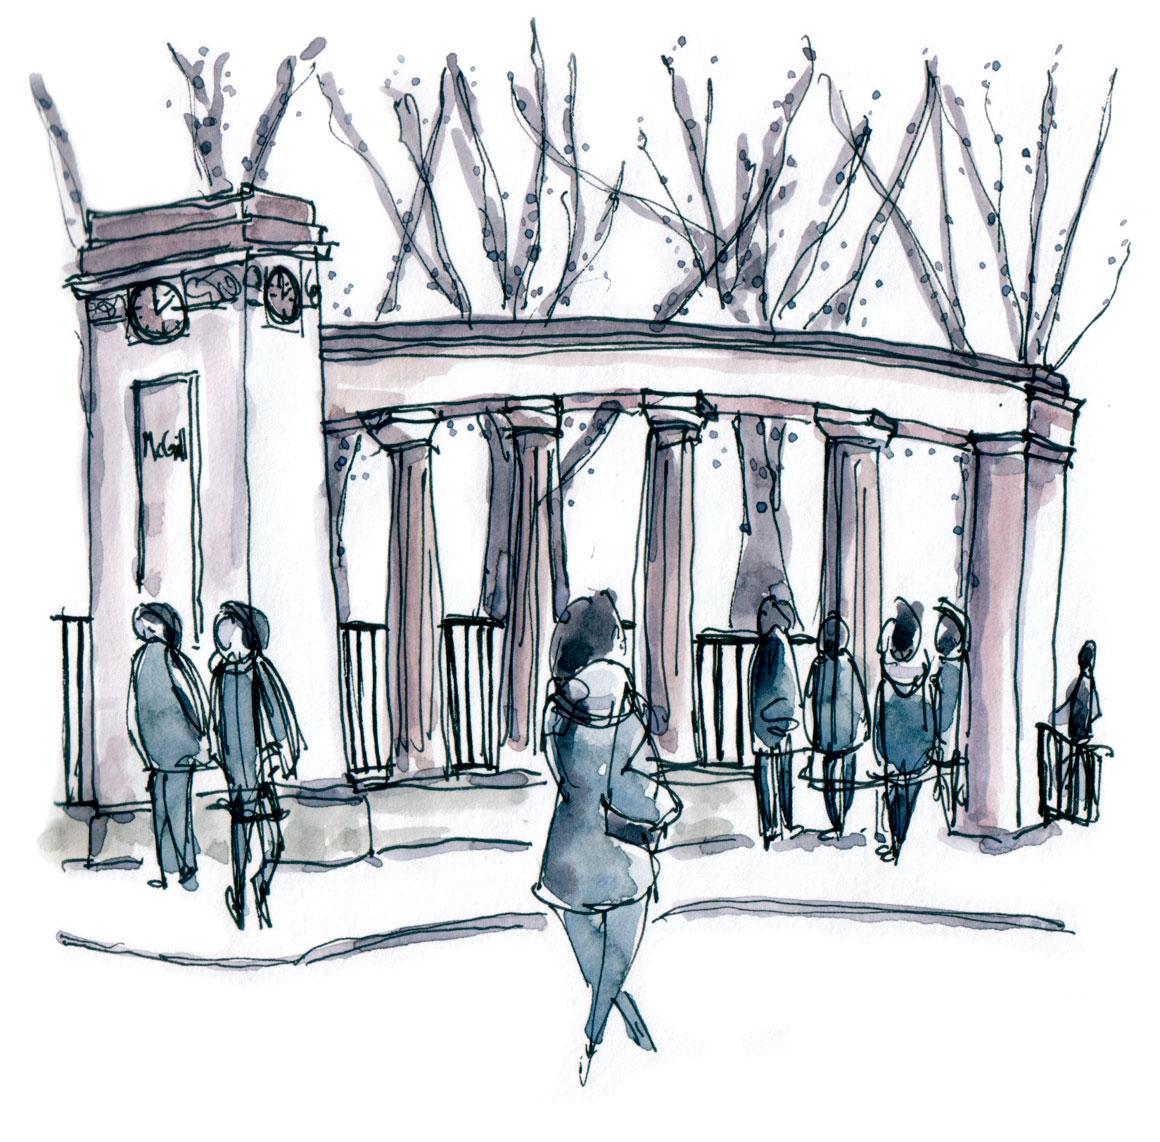 McGill gates